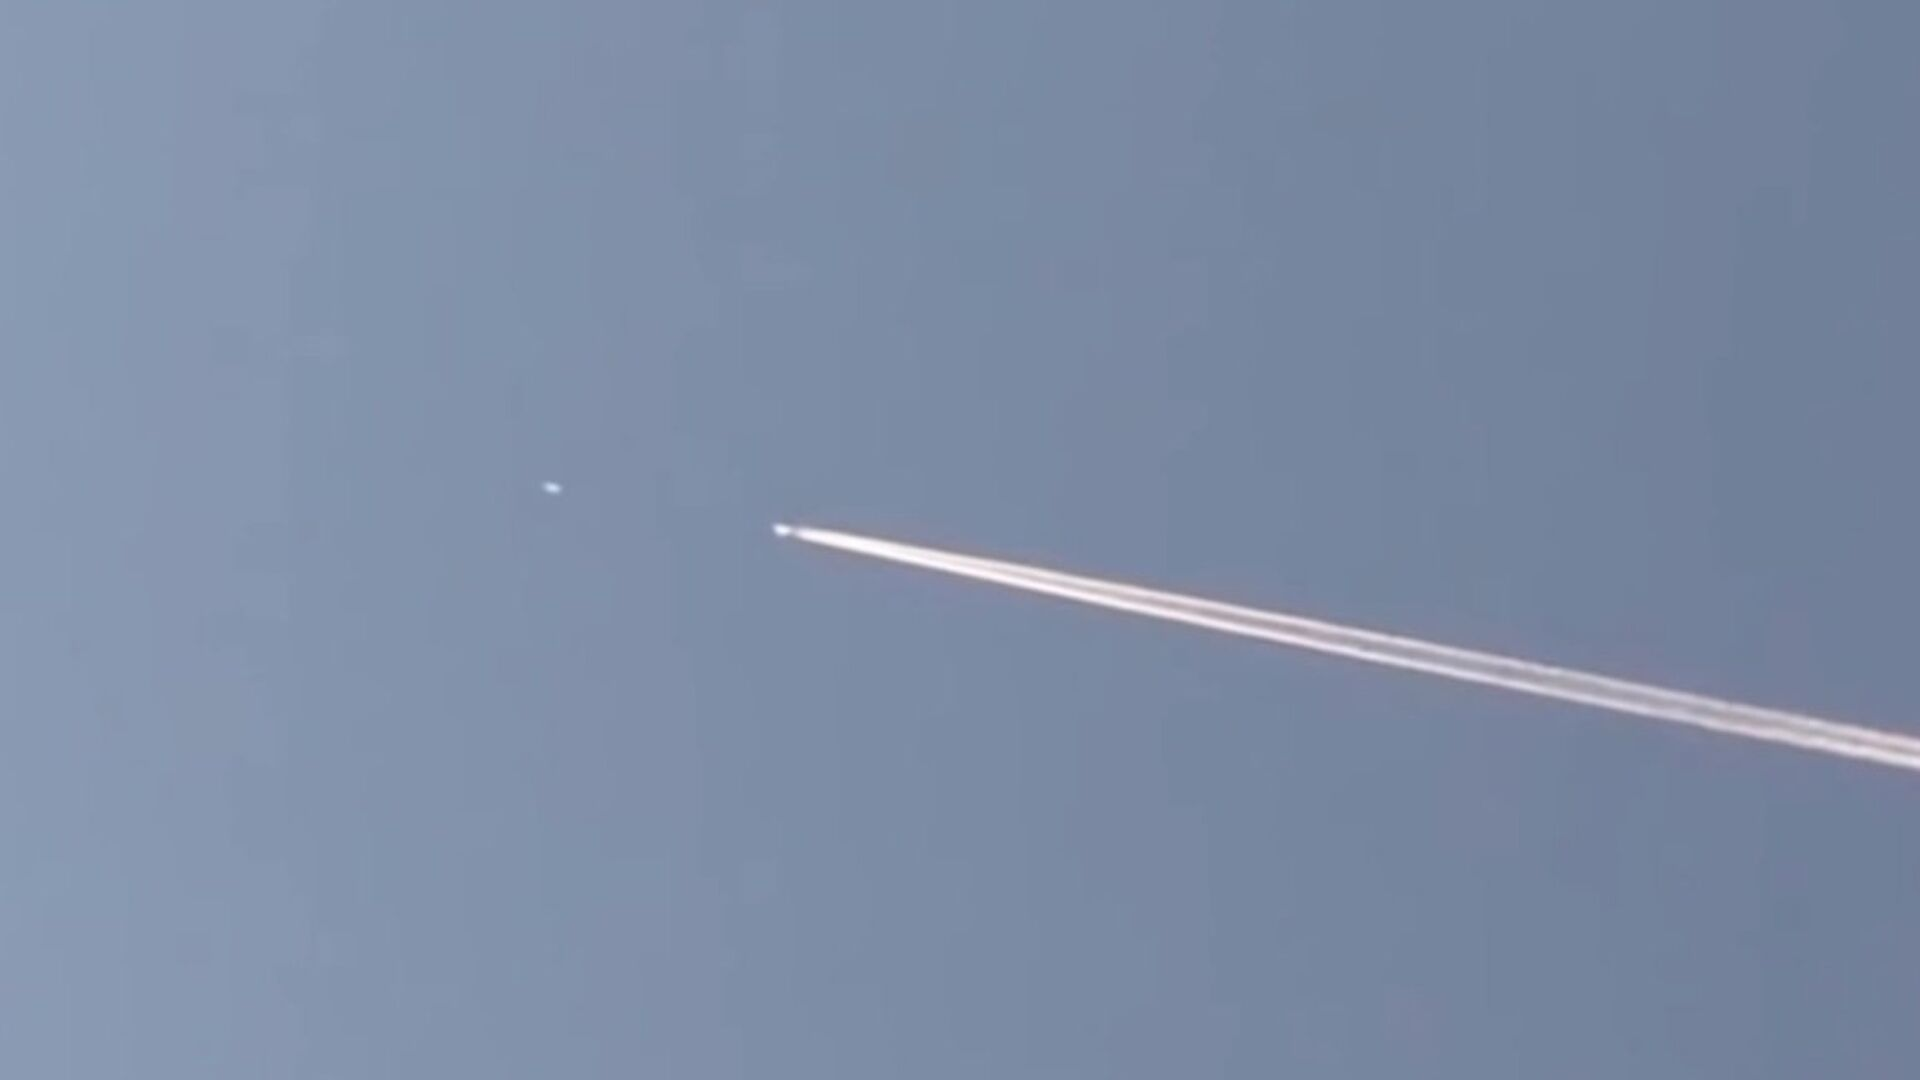 UFO Chases Passenger Jet Through The Sky As Baffled Witness Captures Video - Sputnik Italia, 1920, 29.07.2021